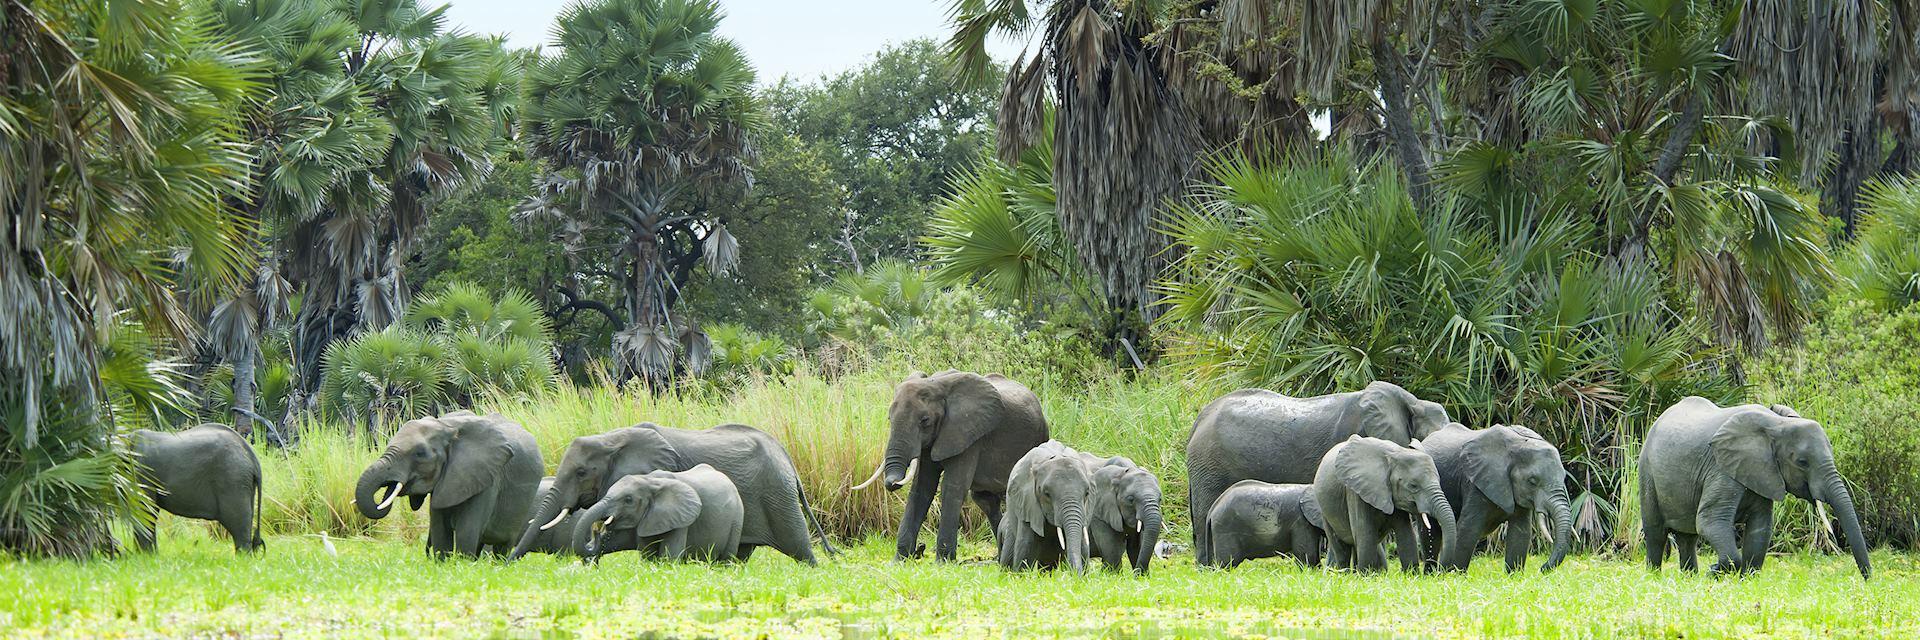 Elephant, Selous Game Reserve